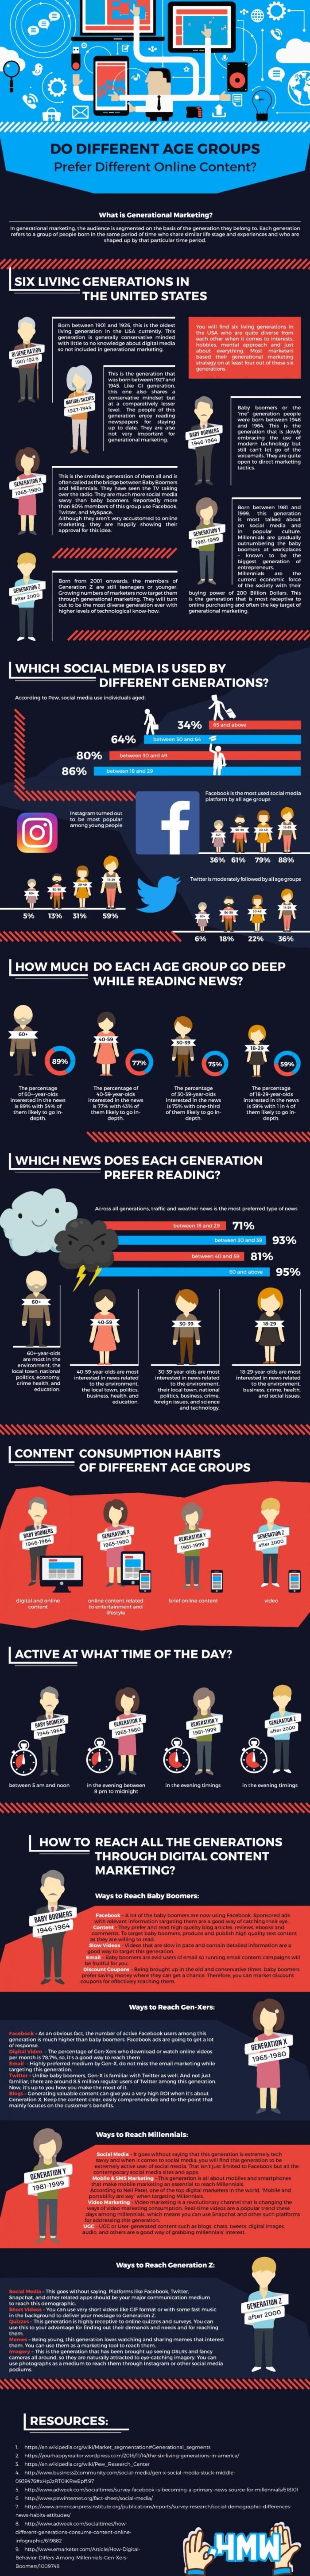 generational content info